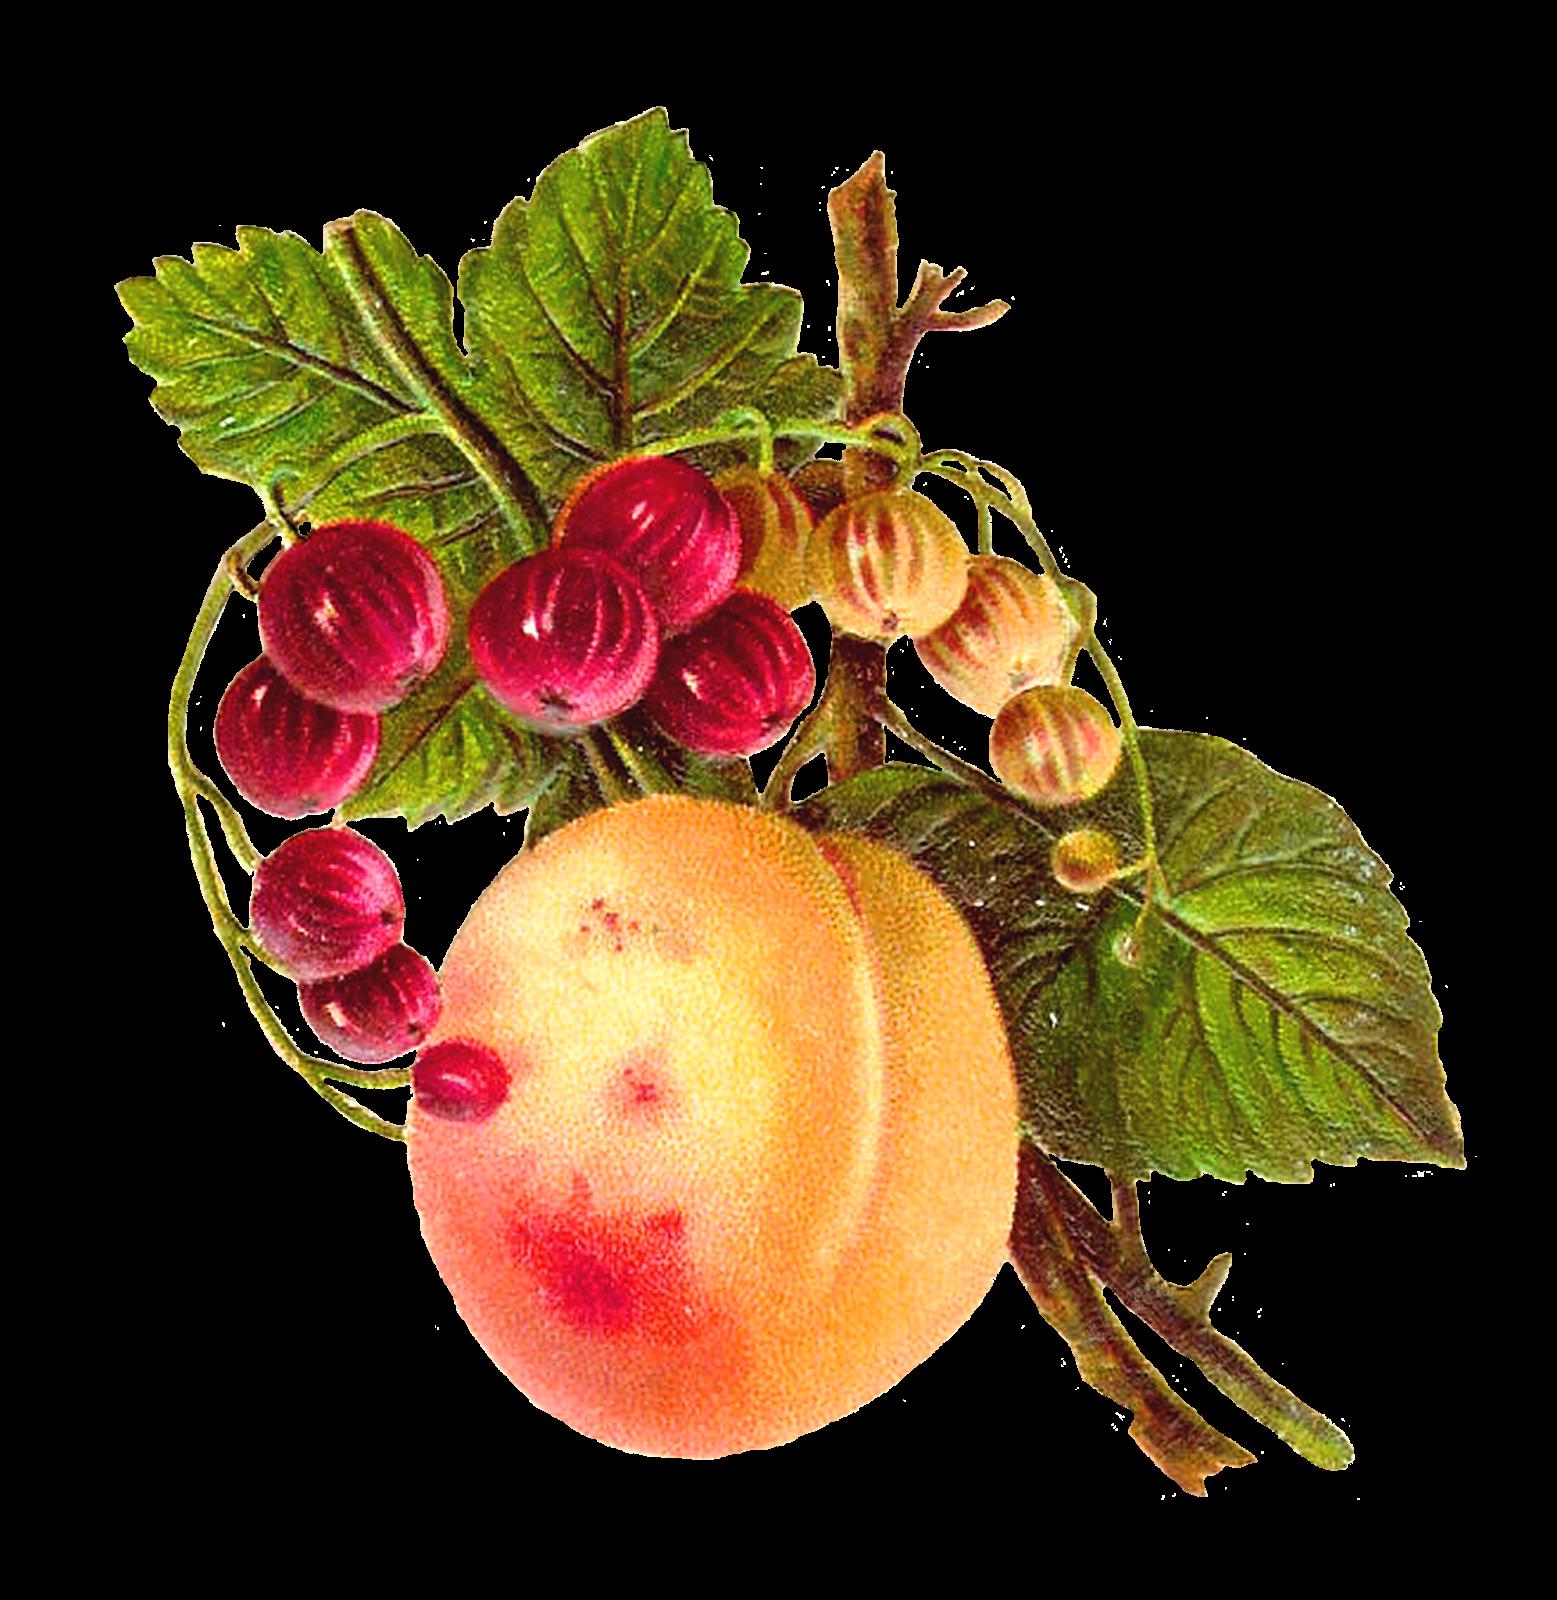 Florida clipart vintage. Antique images botanical fruit